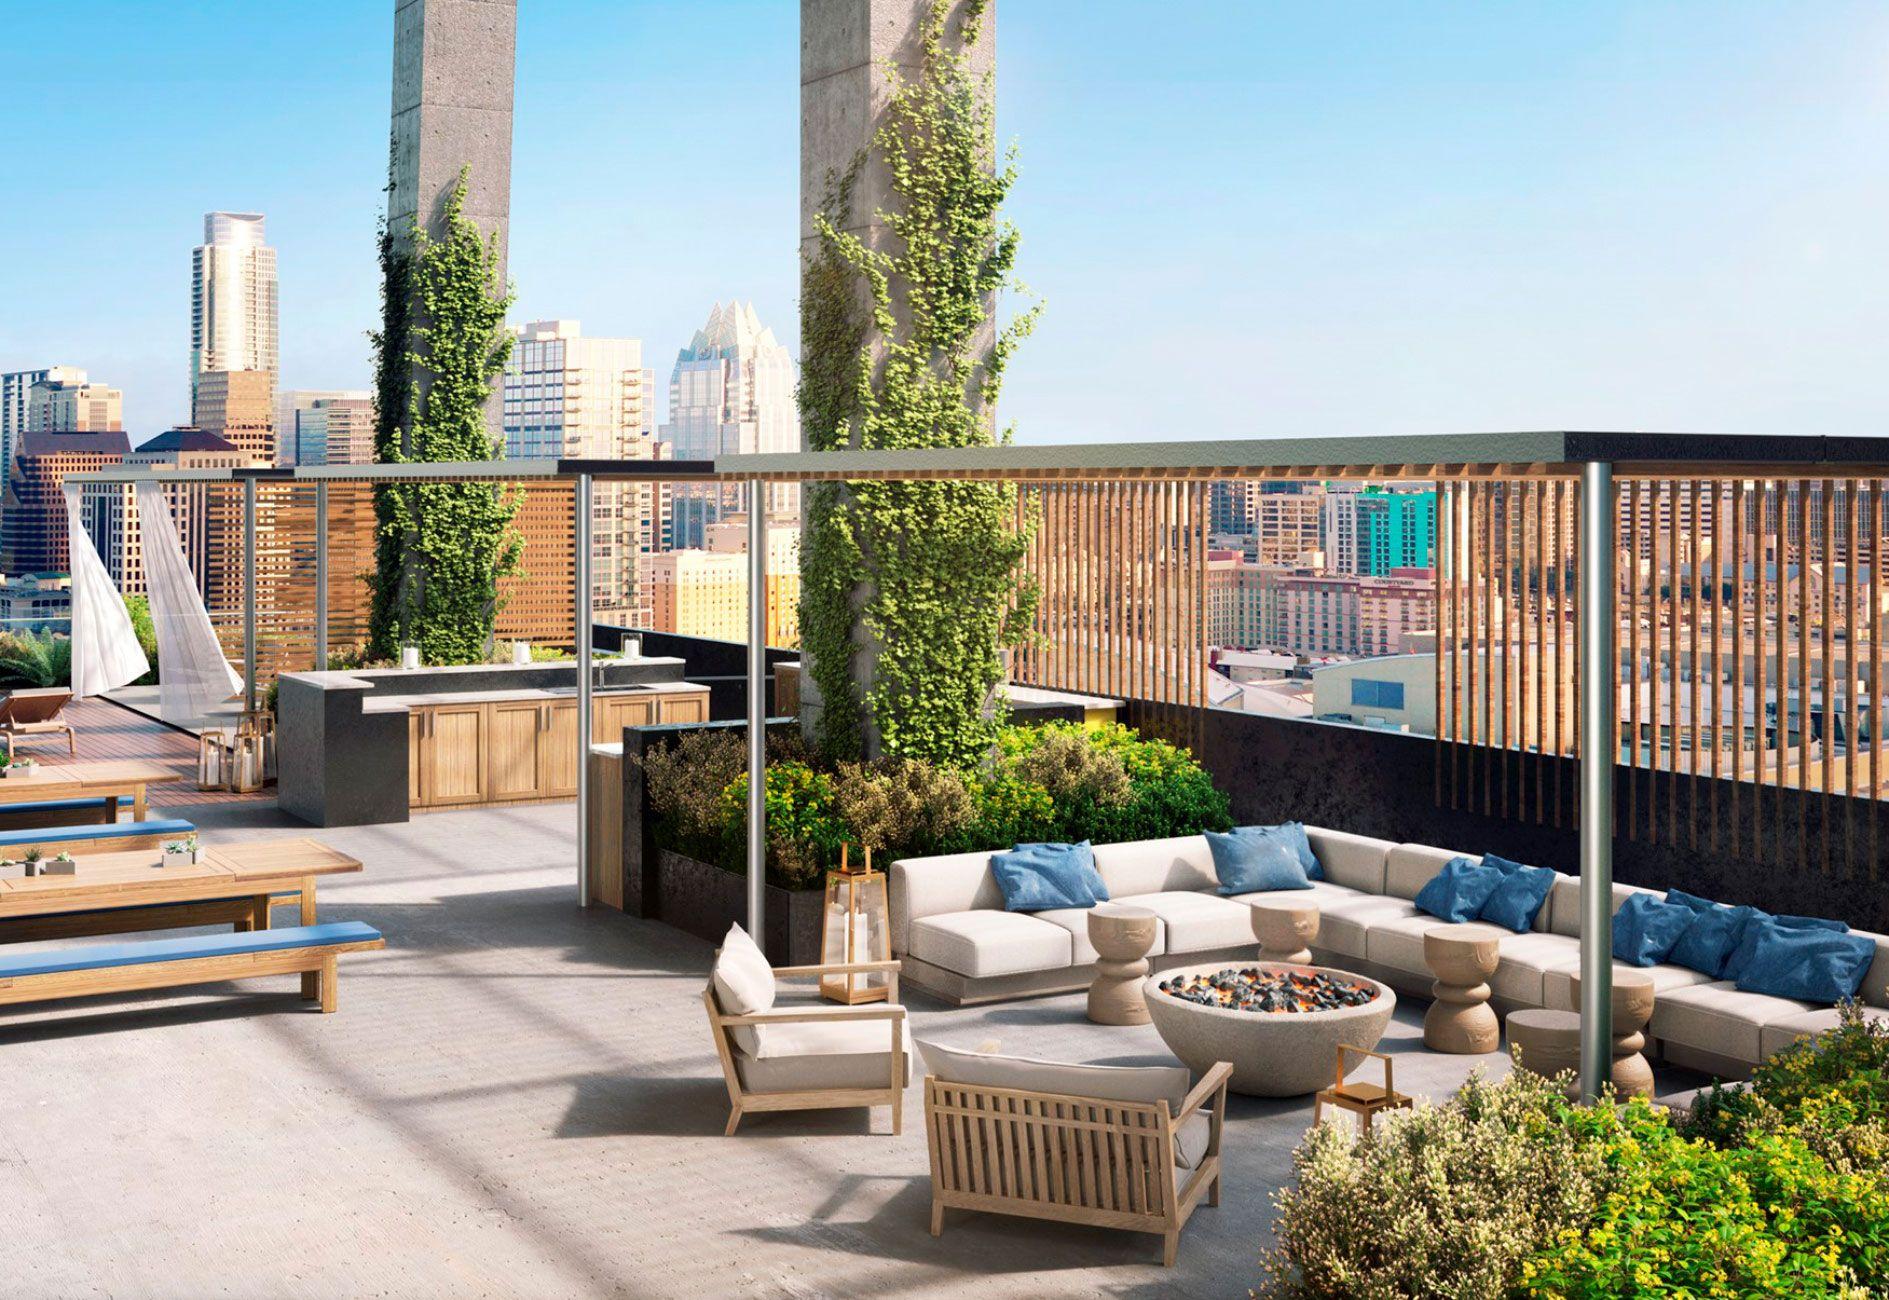 70 Rainey Markzeff Design Rooftop Patio Luxury Apartment Building Outdoor Decor